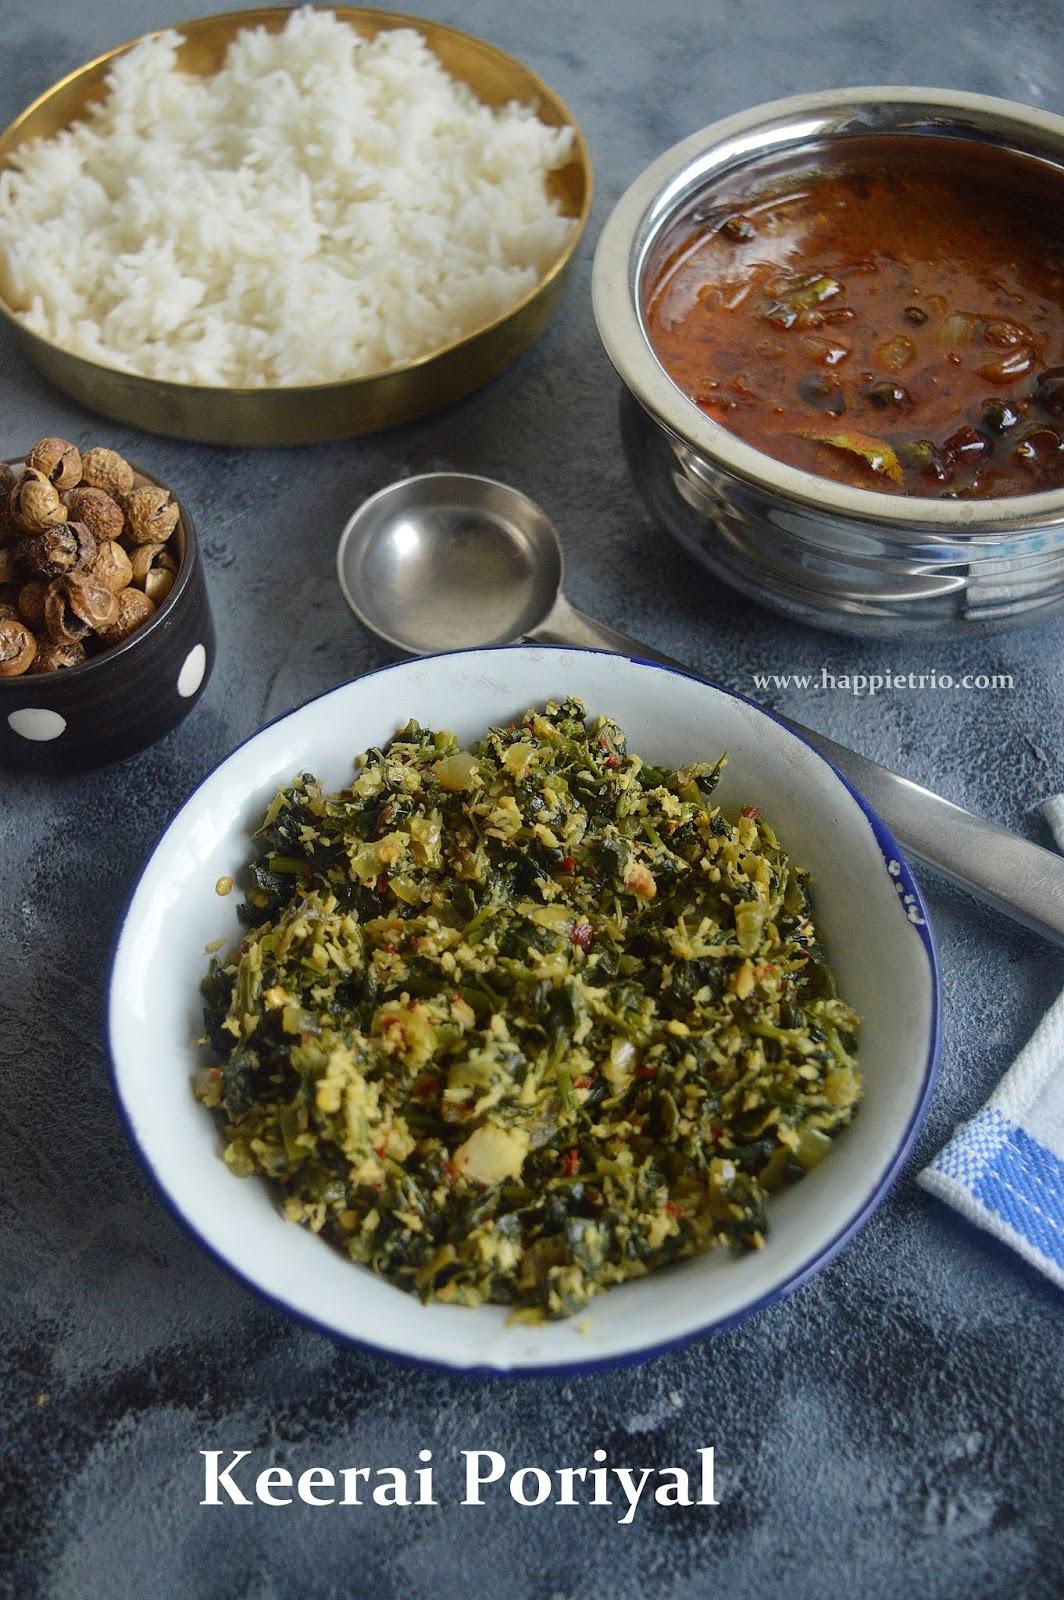 Arai Keerai Poriyal | Greens Stir Fry